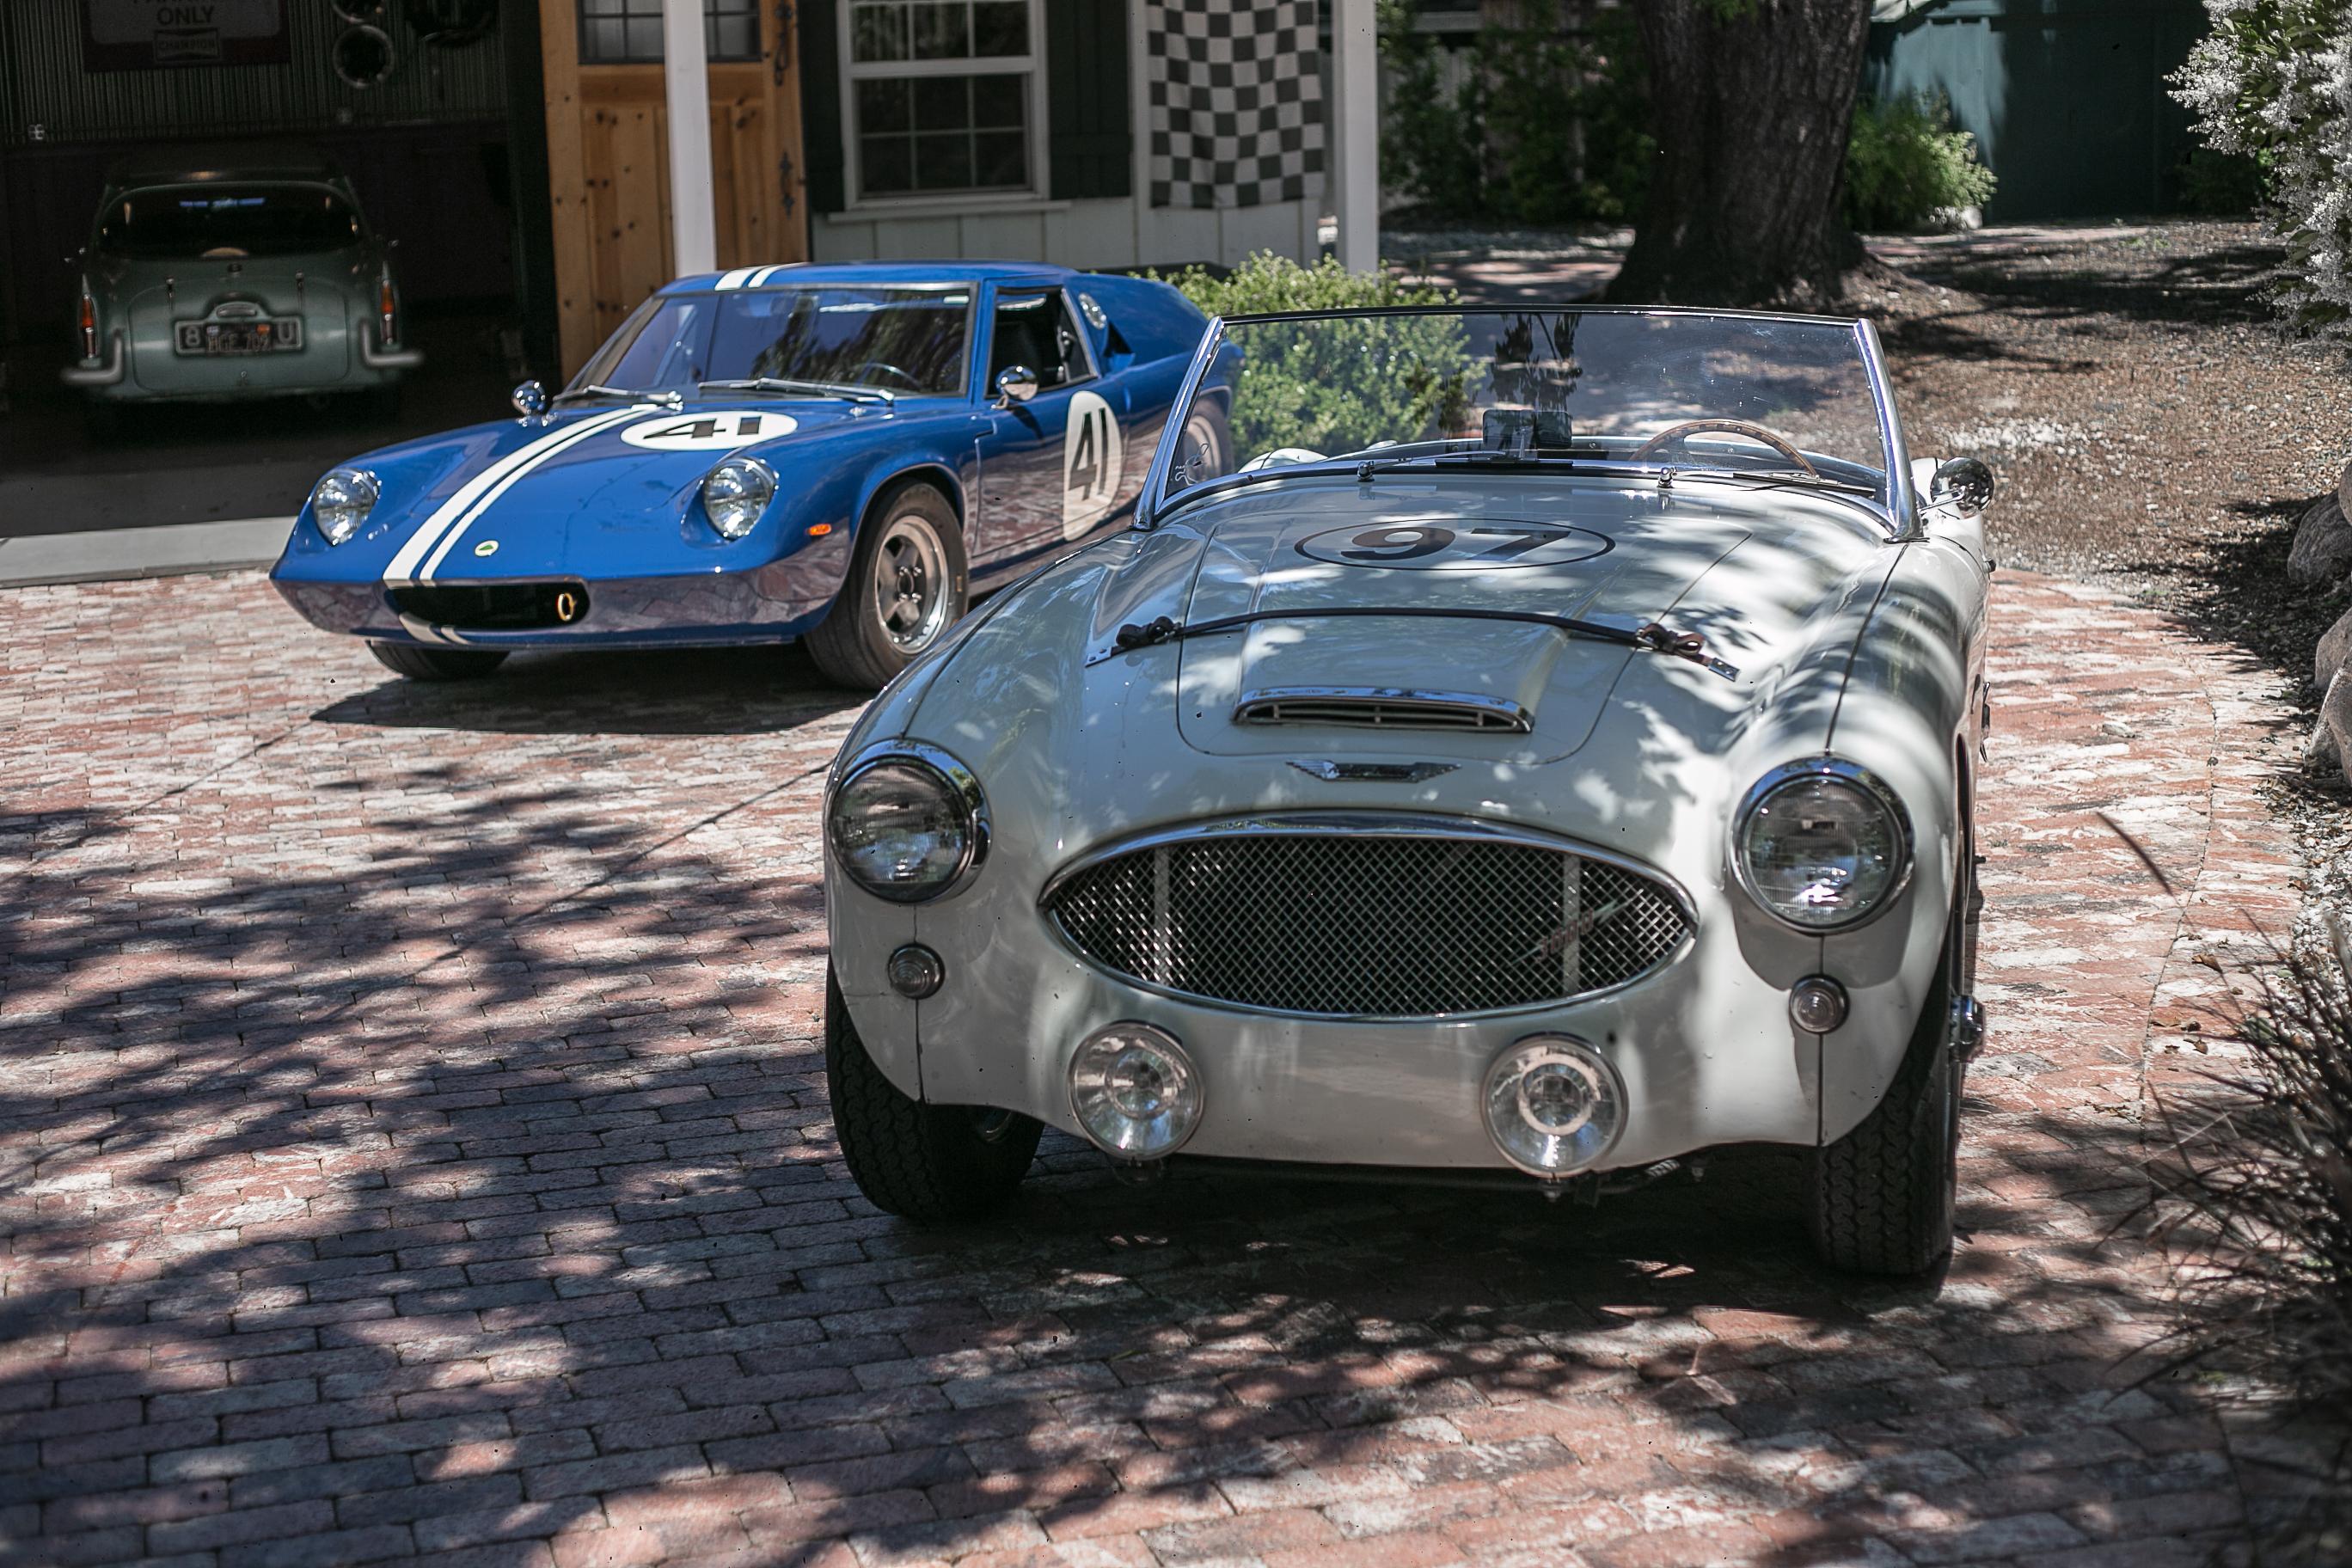 A 1960 Austin-Healey 3000 MkI and a 1970 Lotus Europa.